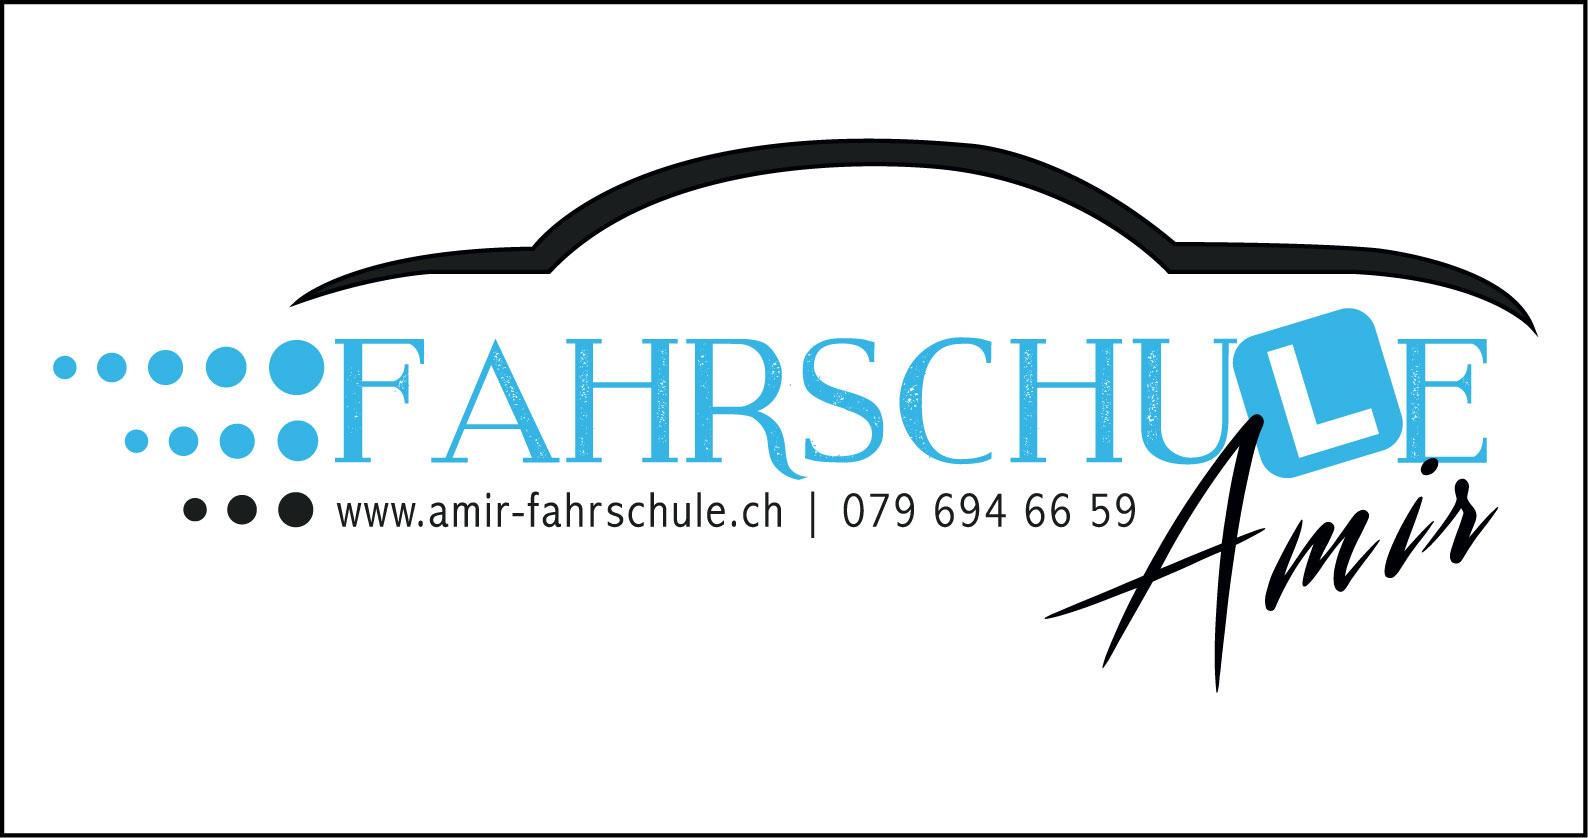 amir-fahrschule-foto